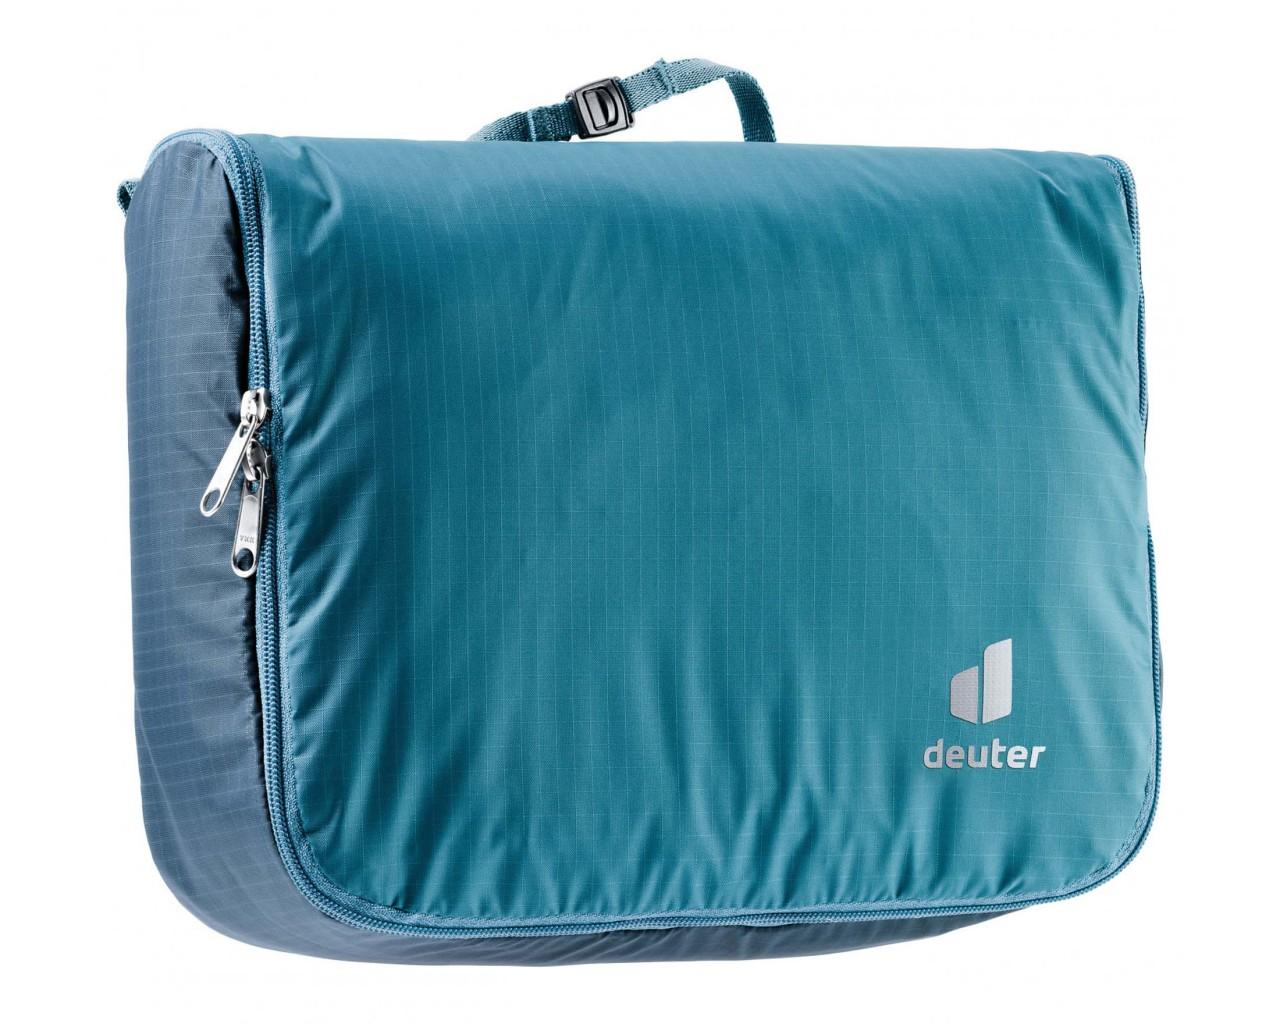 Deuter Wash Center Lite II - 3 litres wash pack | denim-arctic